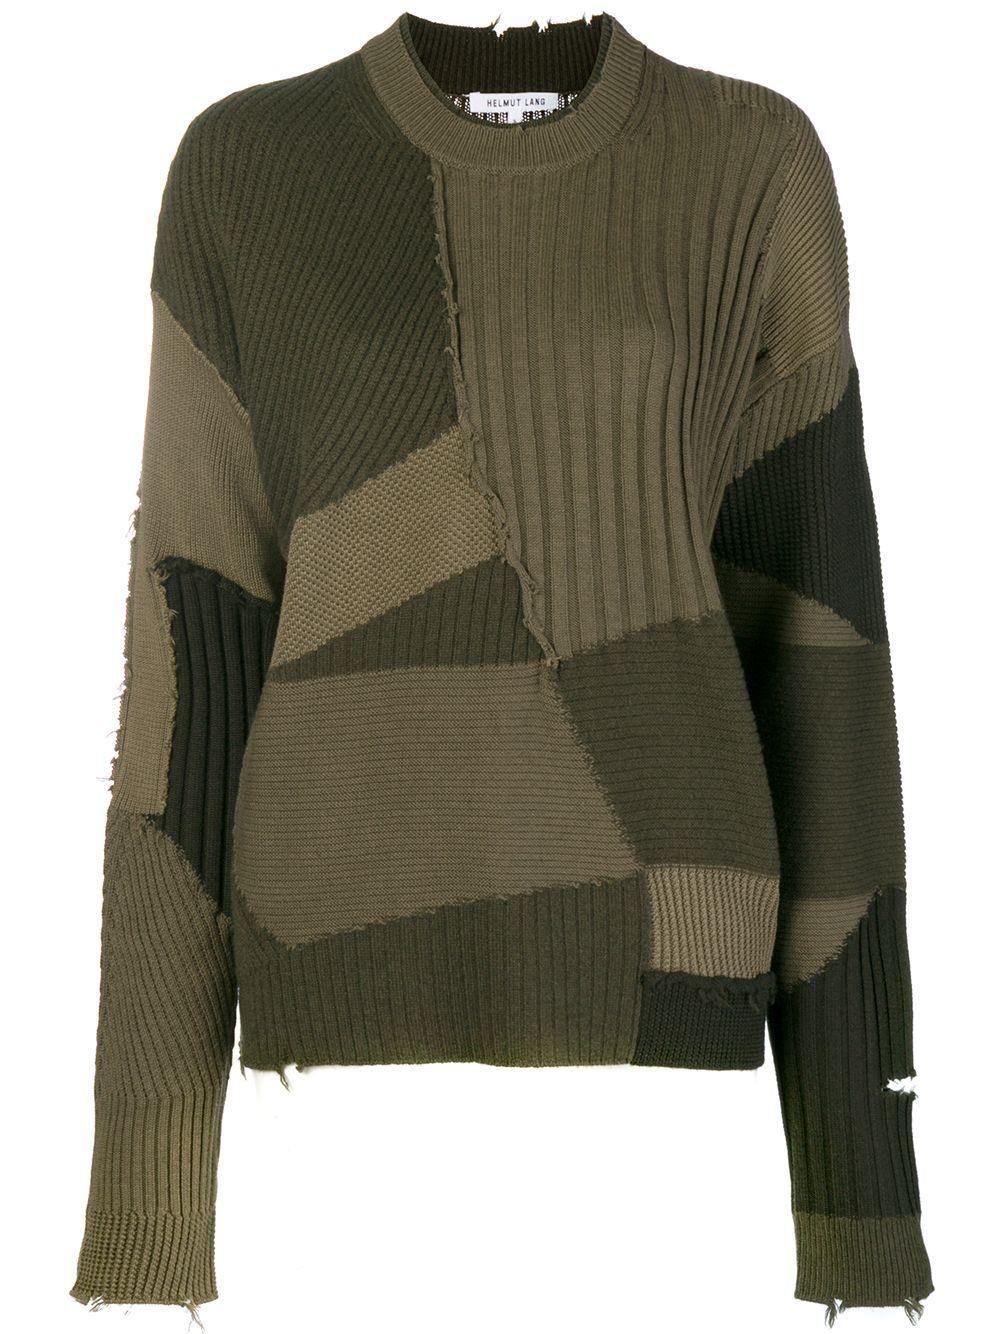 0a1cd41e Military Grunge Patchwork Knit | Svean AS Nettbutikk